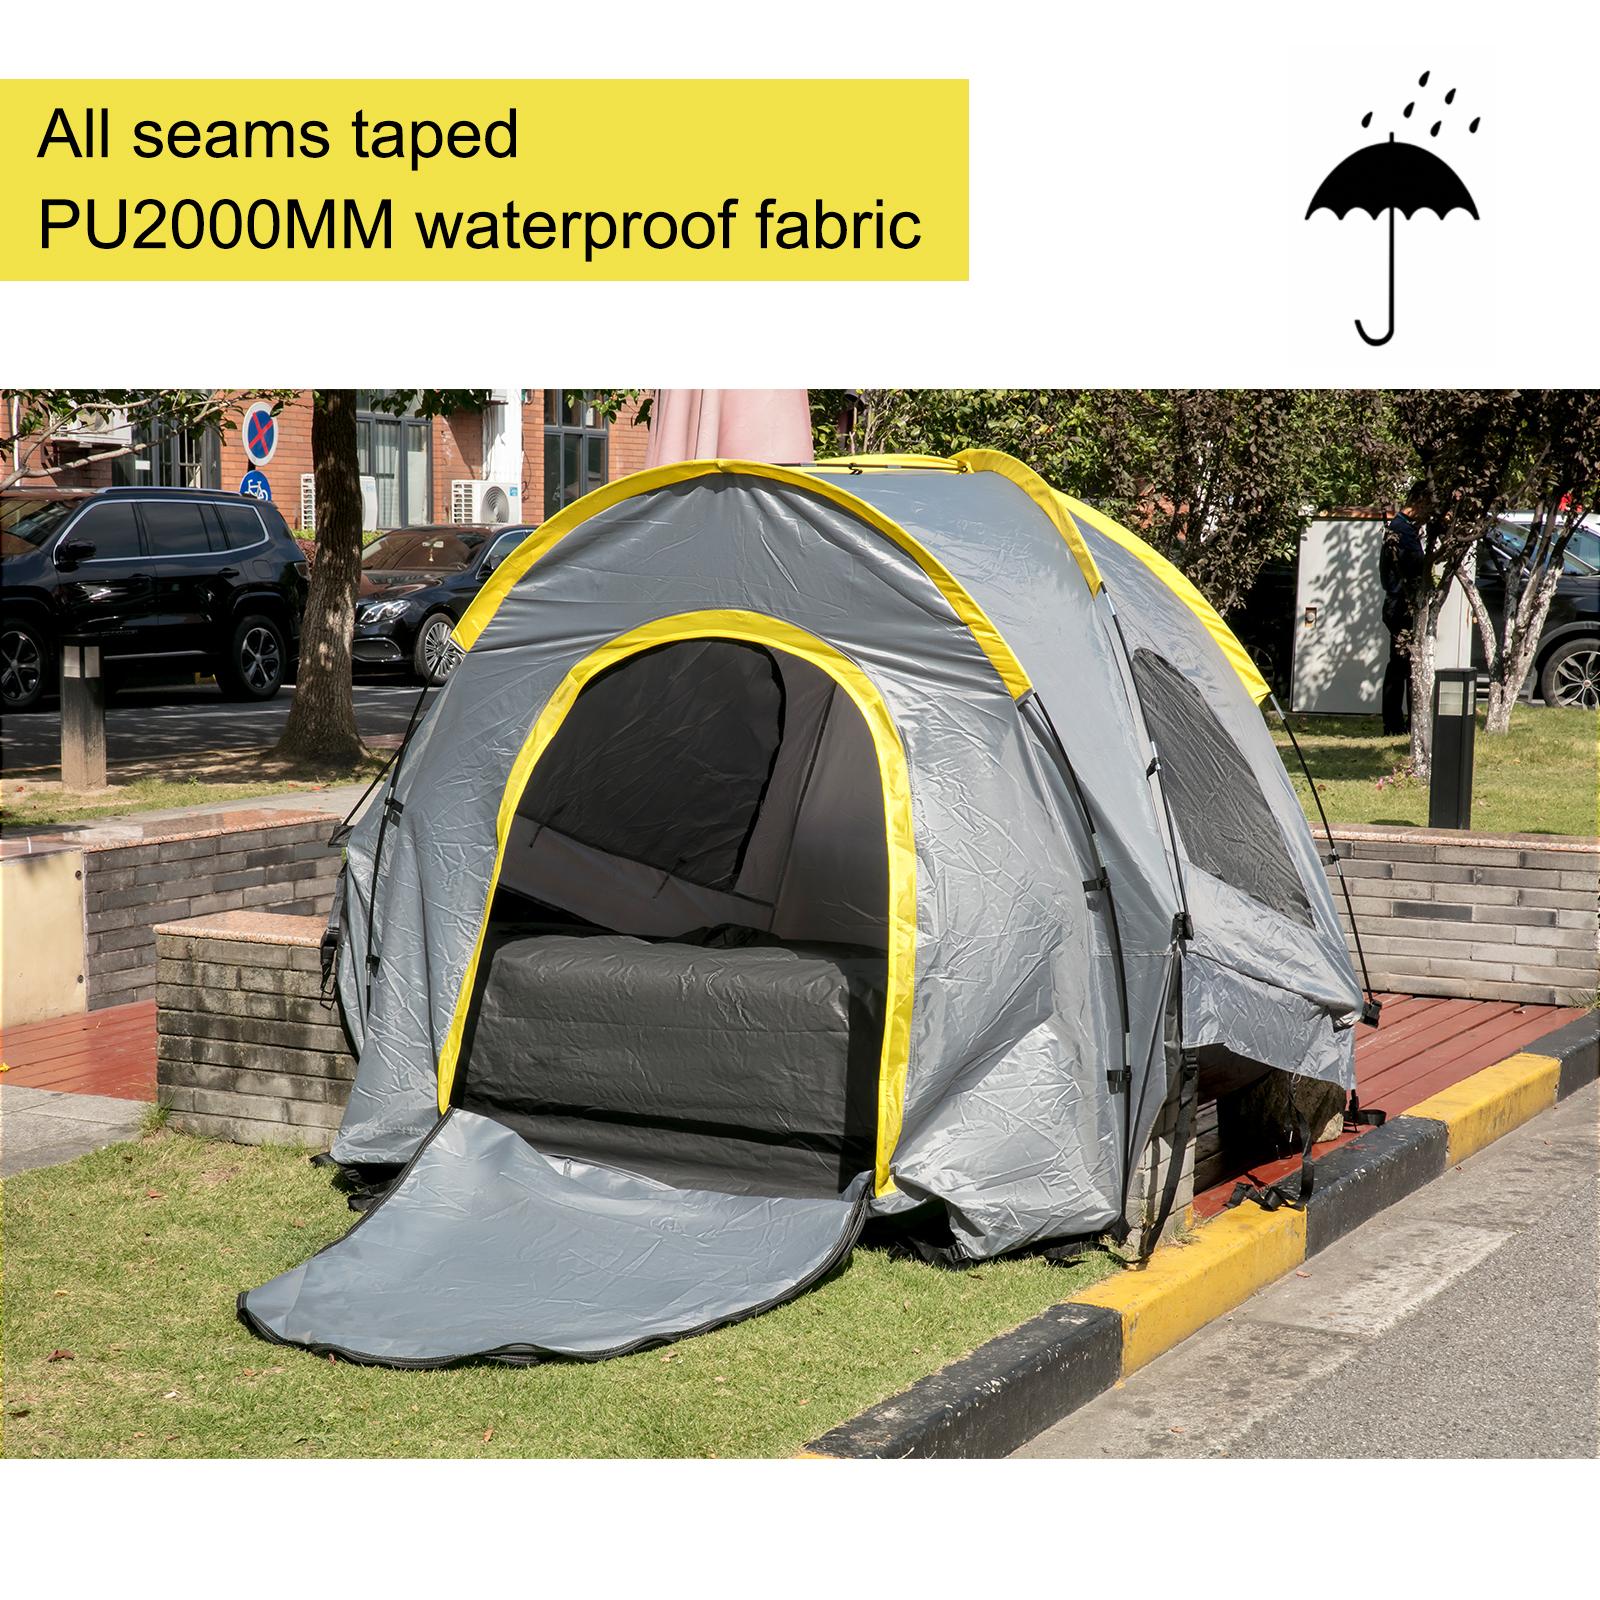 thumbnail 32 - VEVOR Truck Tent Truck Bed Tent 5' - 8' Pickup Tent Waterproof Outdoor Camping